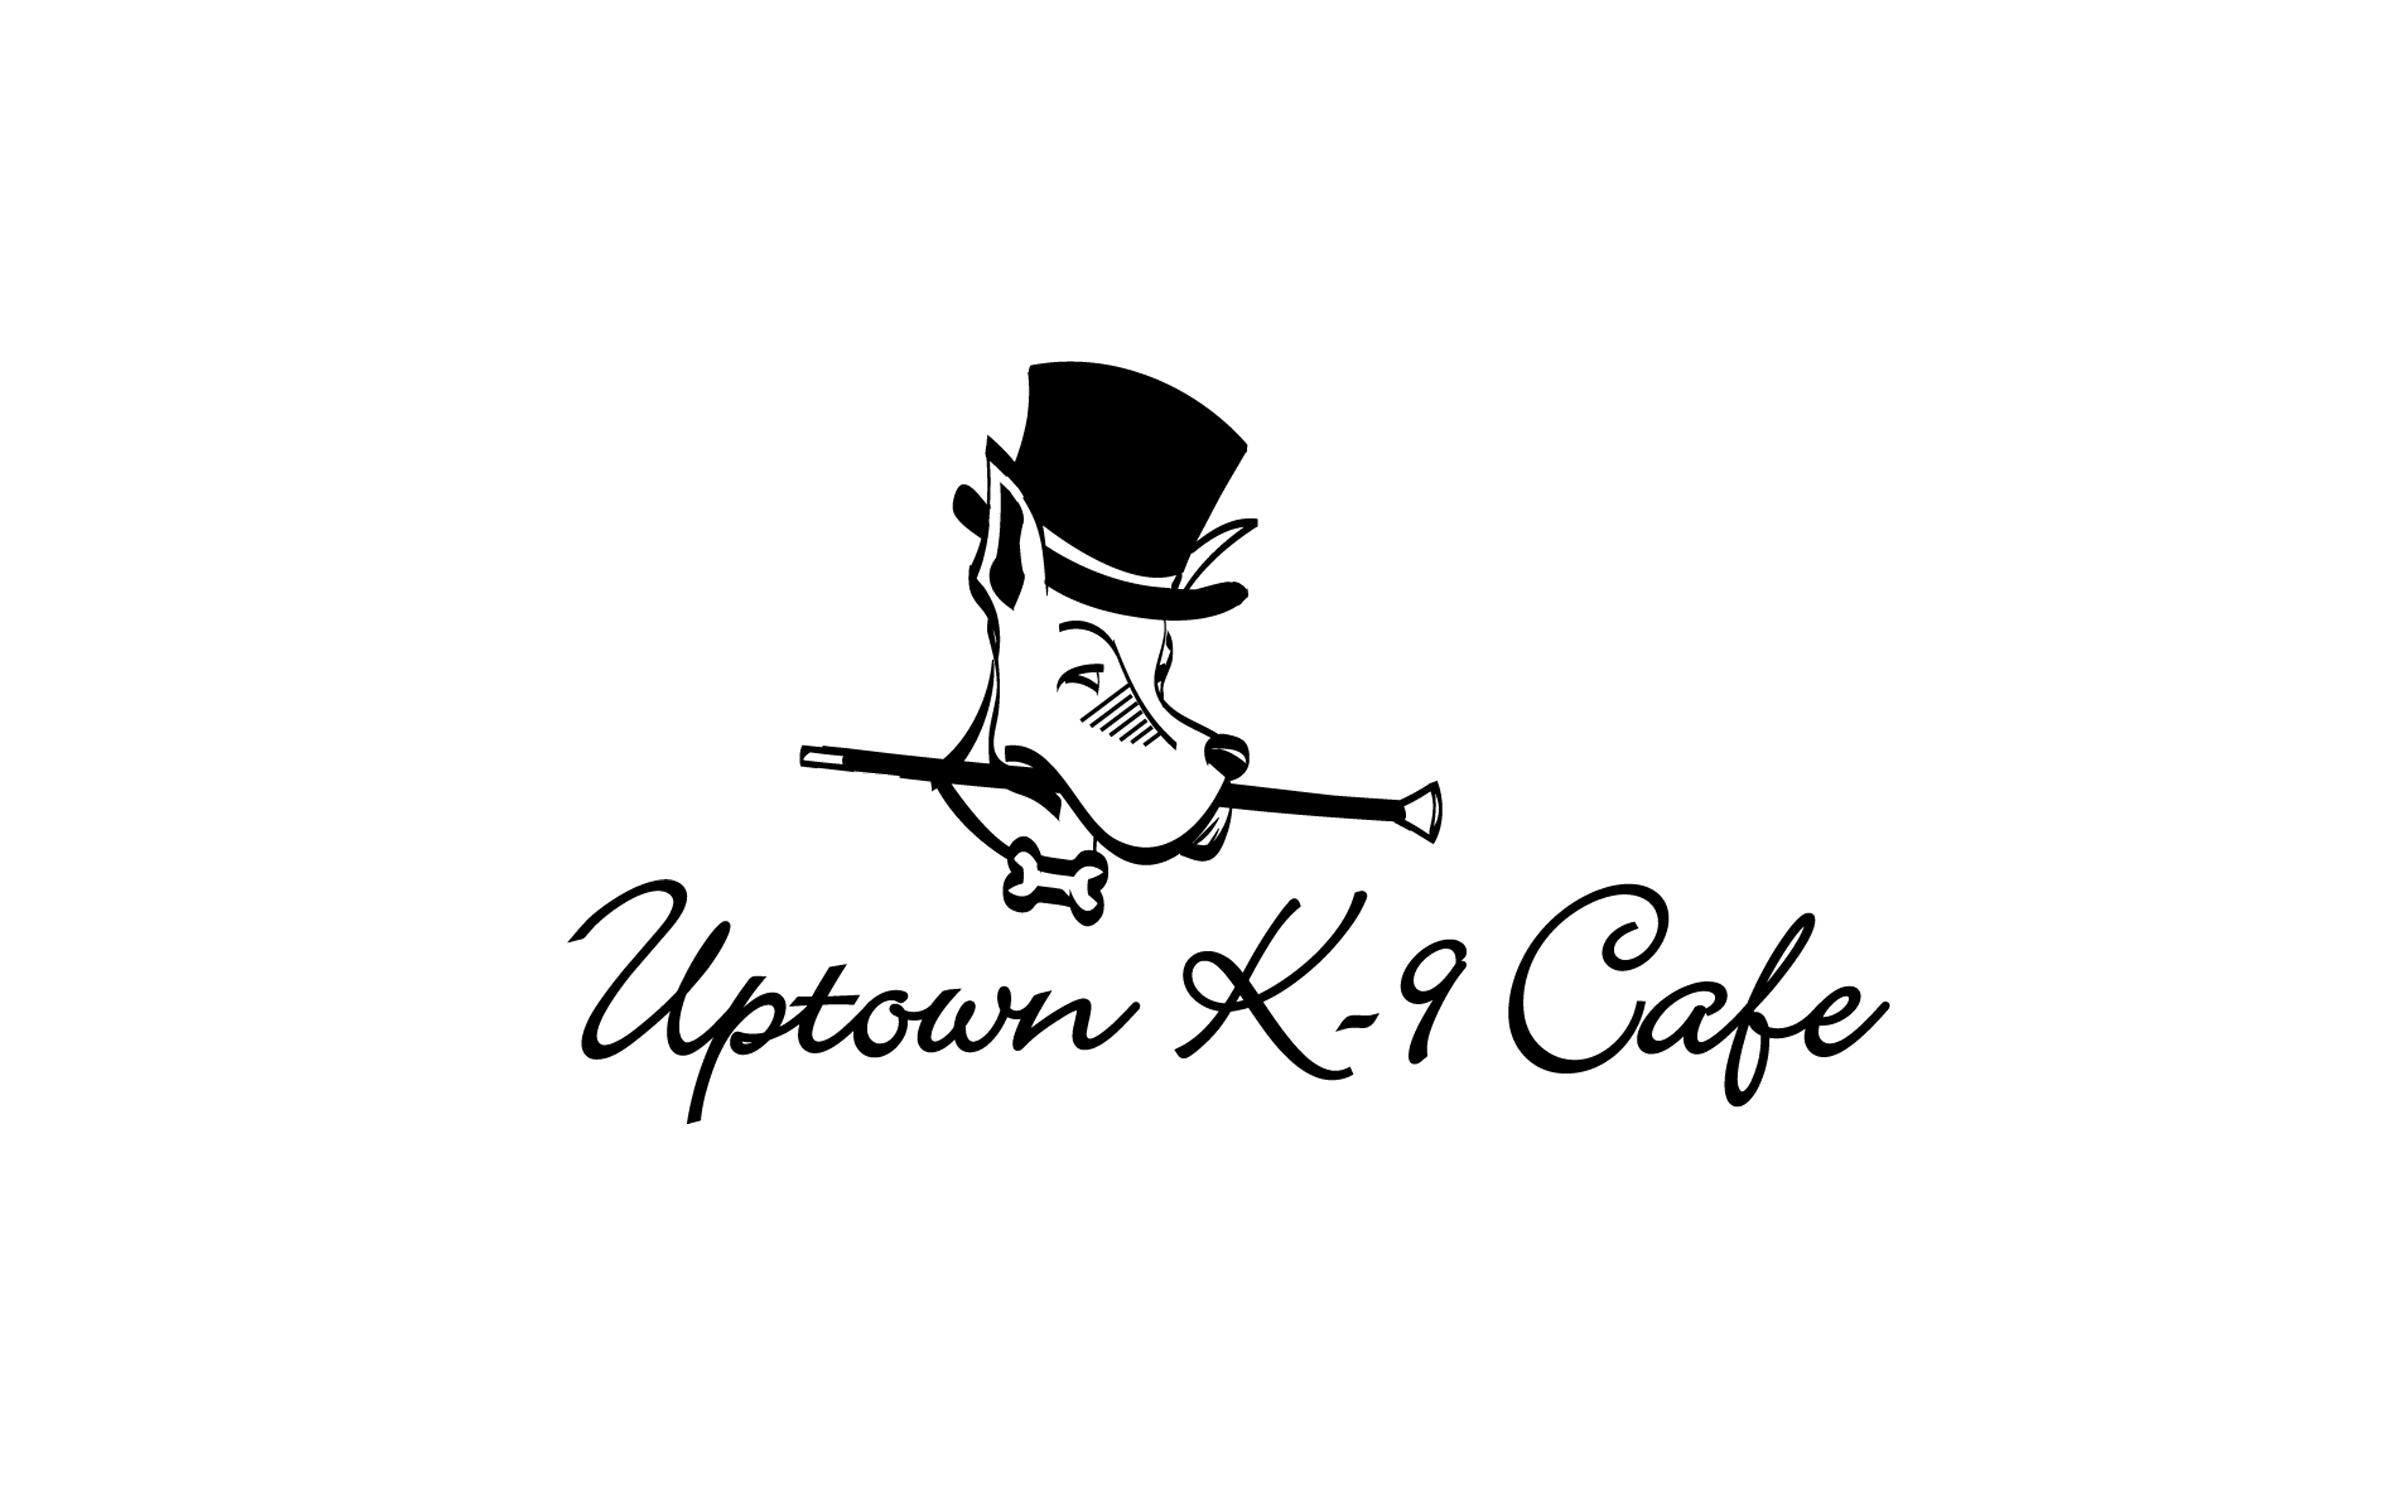 uptown-k9-logo3